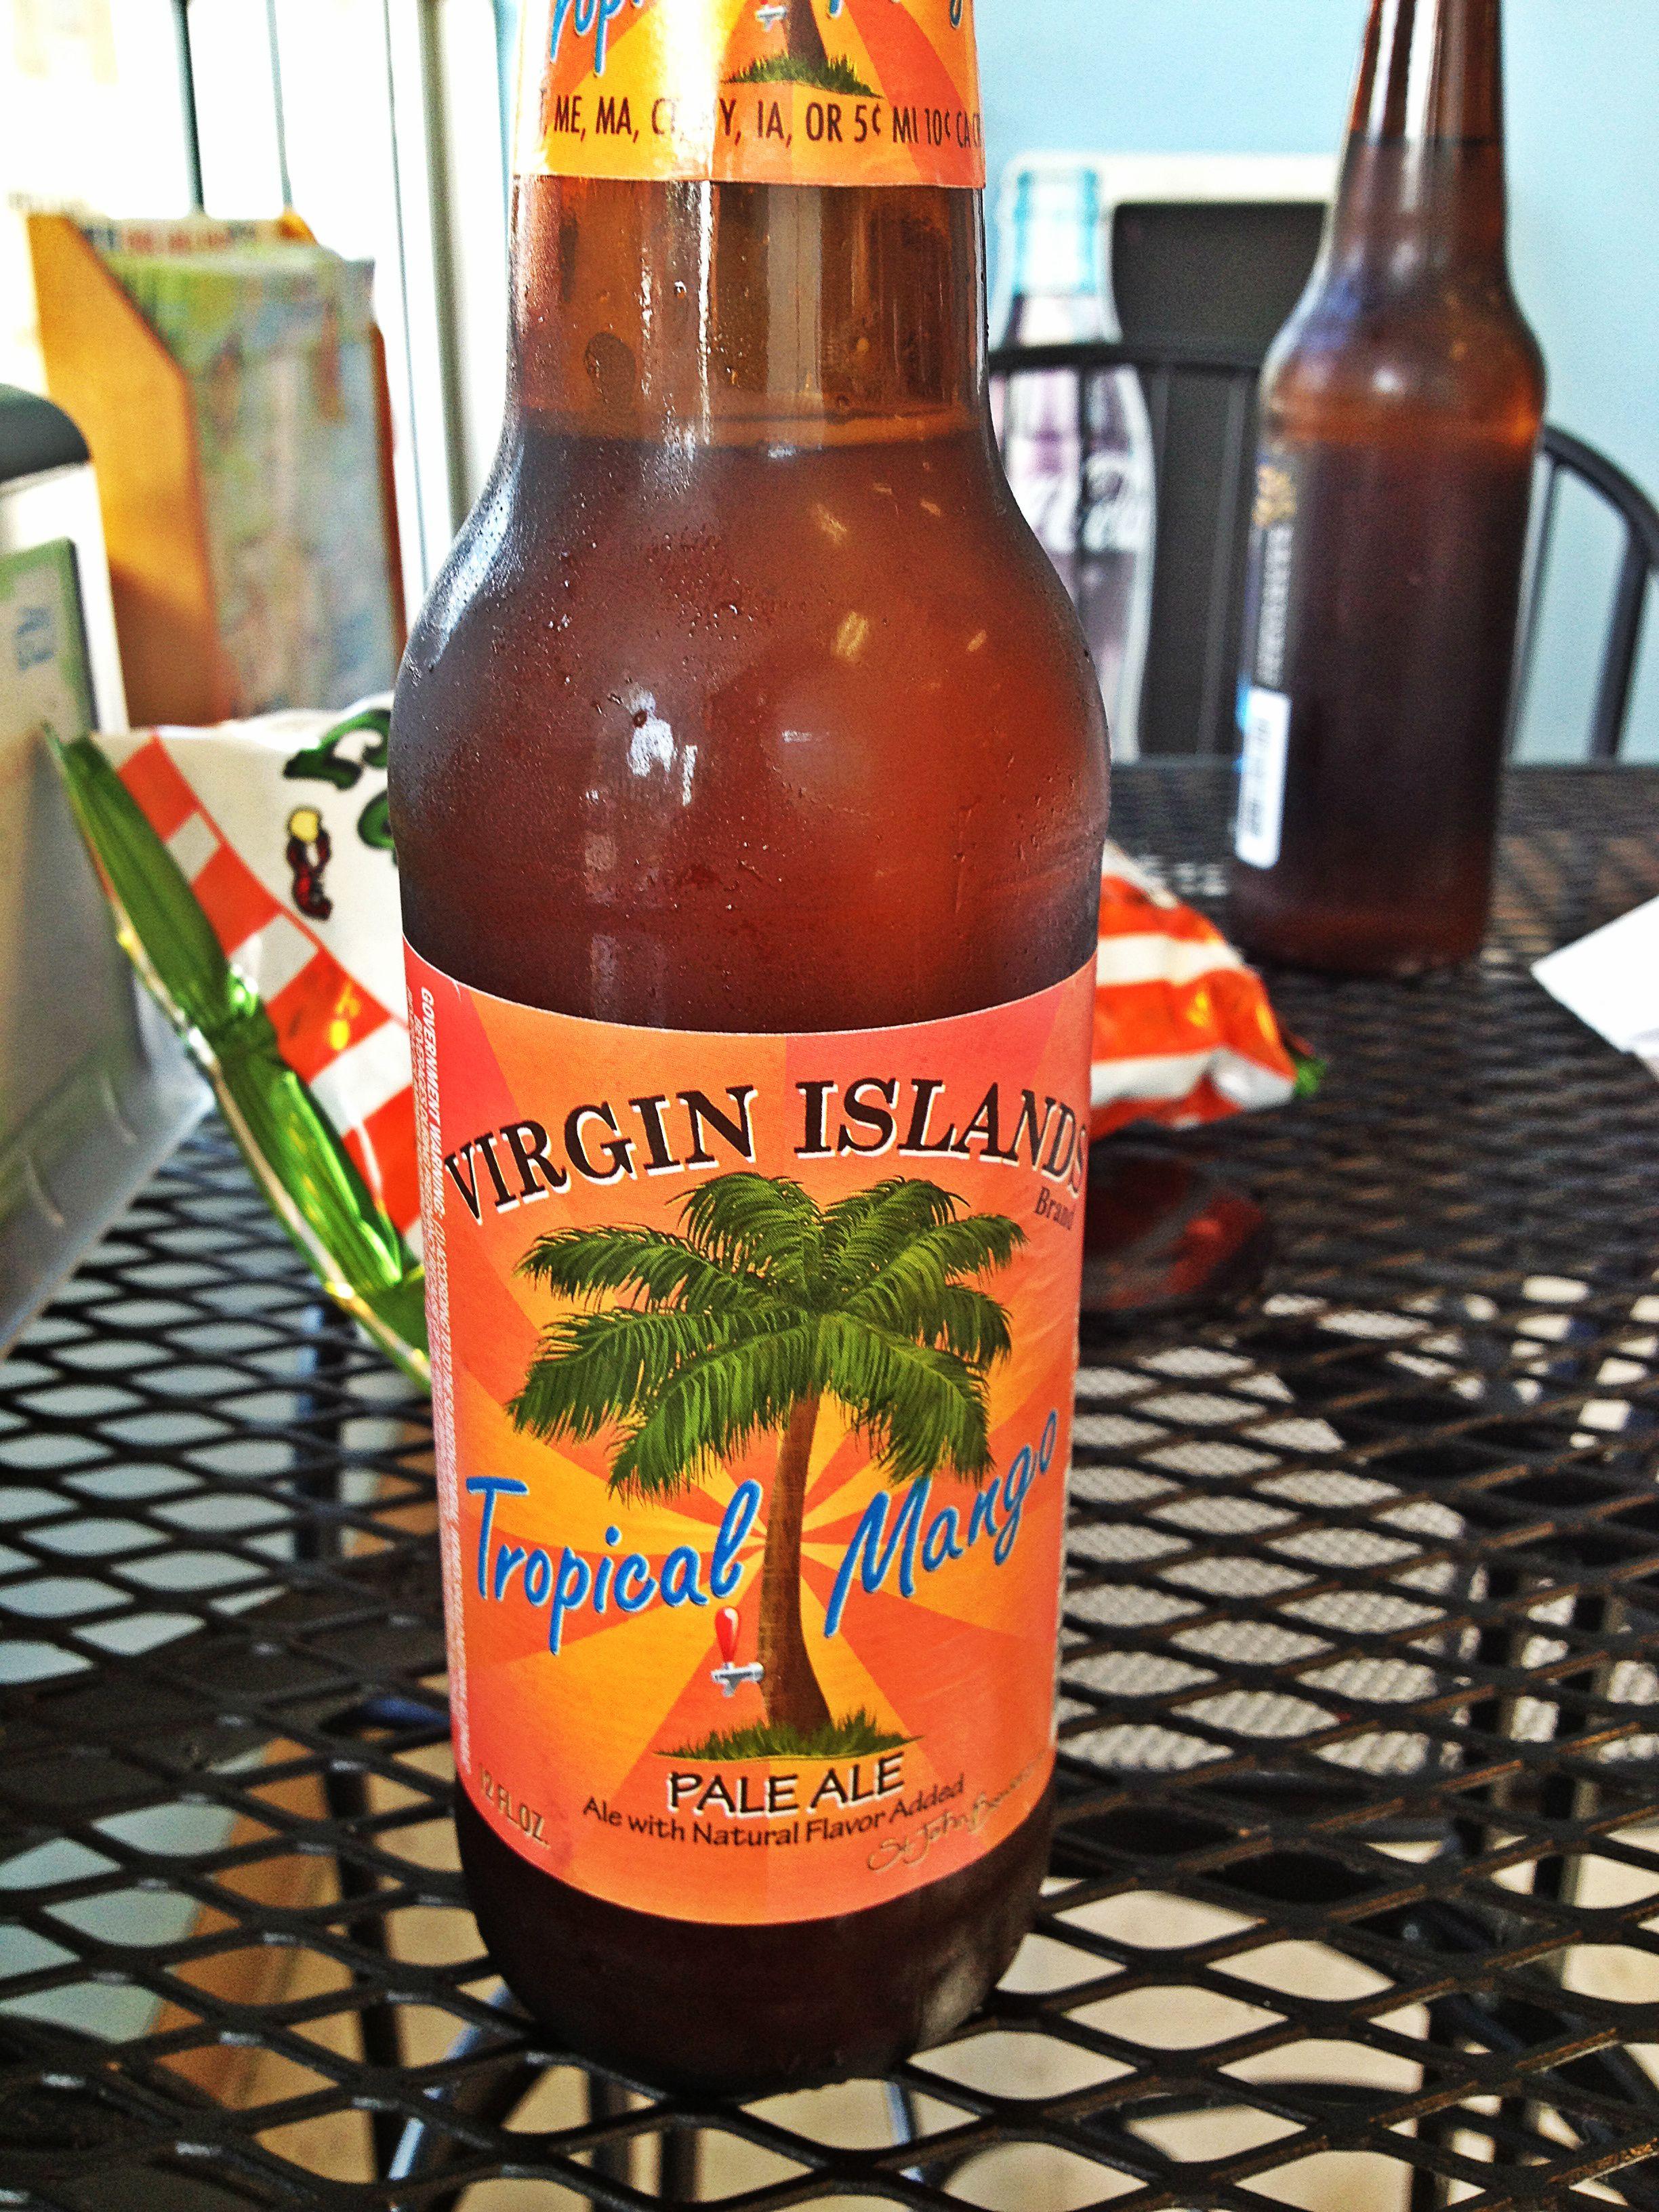 6 Virgin Islands Tropical Mango Pale Ale Manzano S Beachside Deli New Smyrna Fl Beer Ale Beer Drinker